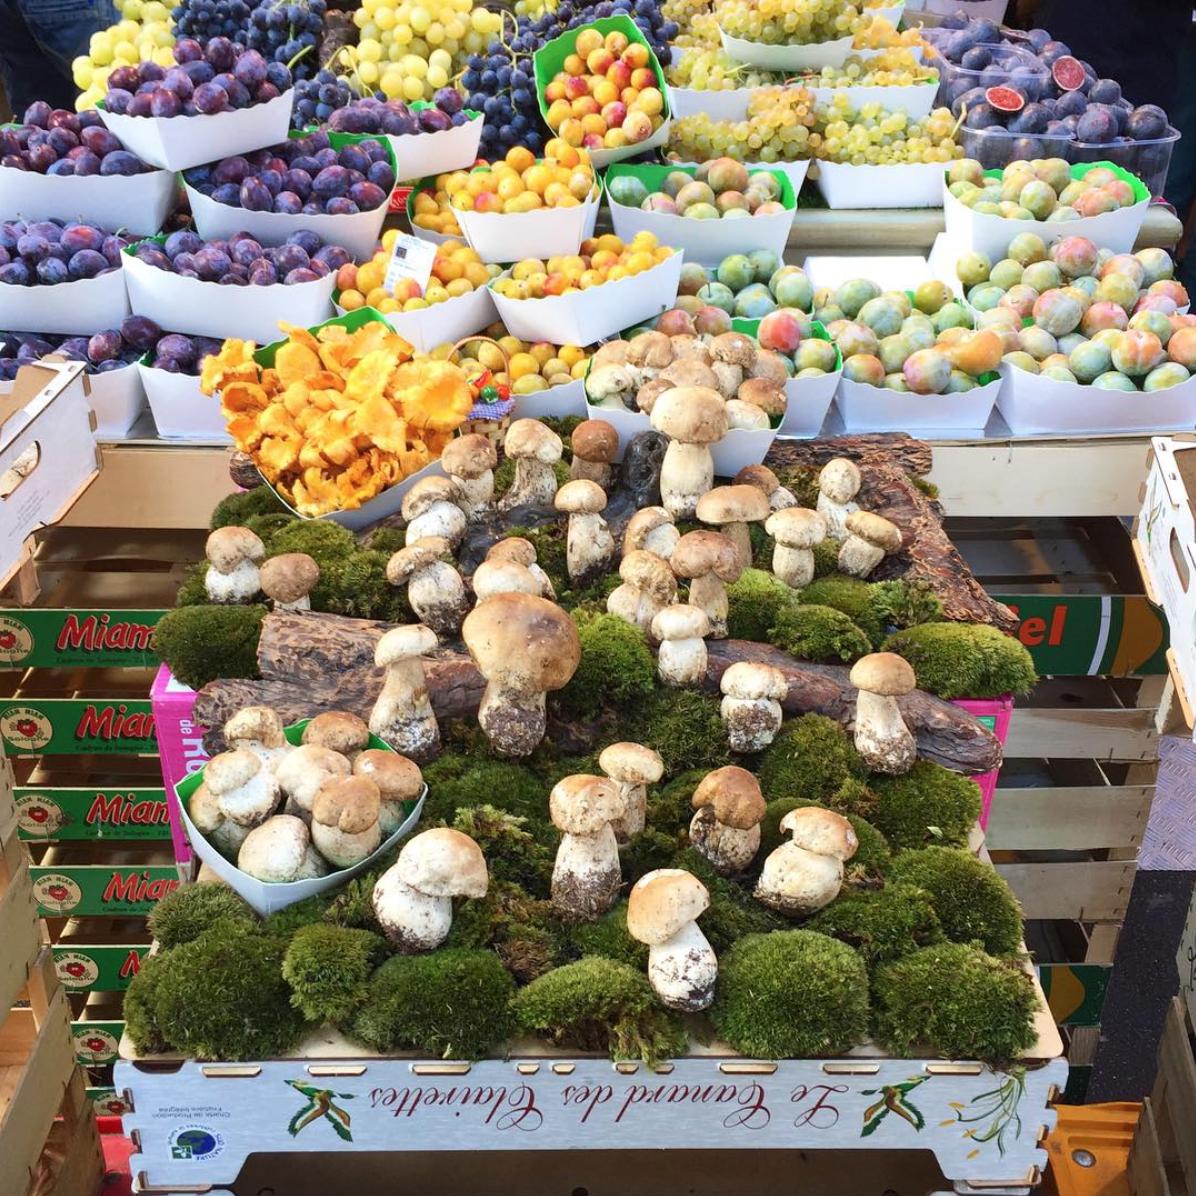 French Farmers Markets - Lisa Edoff